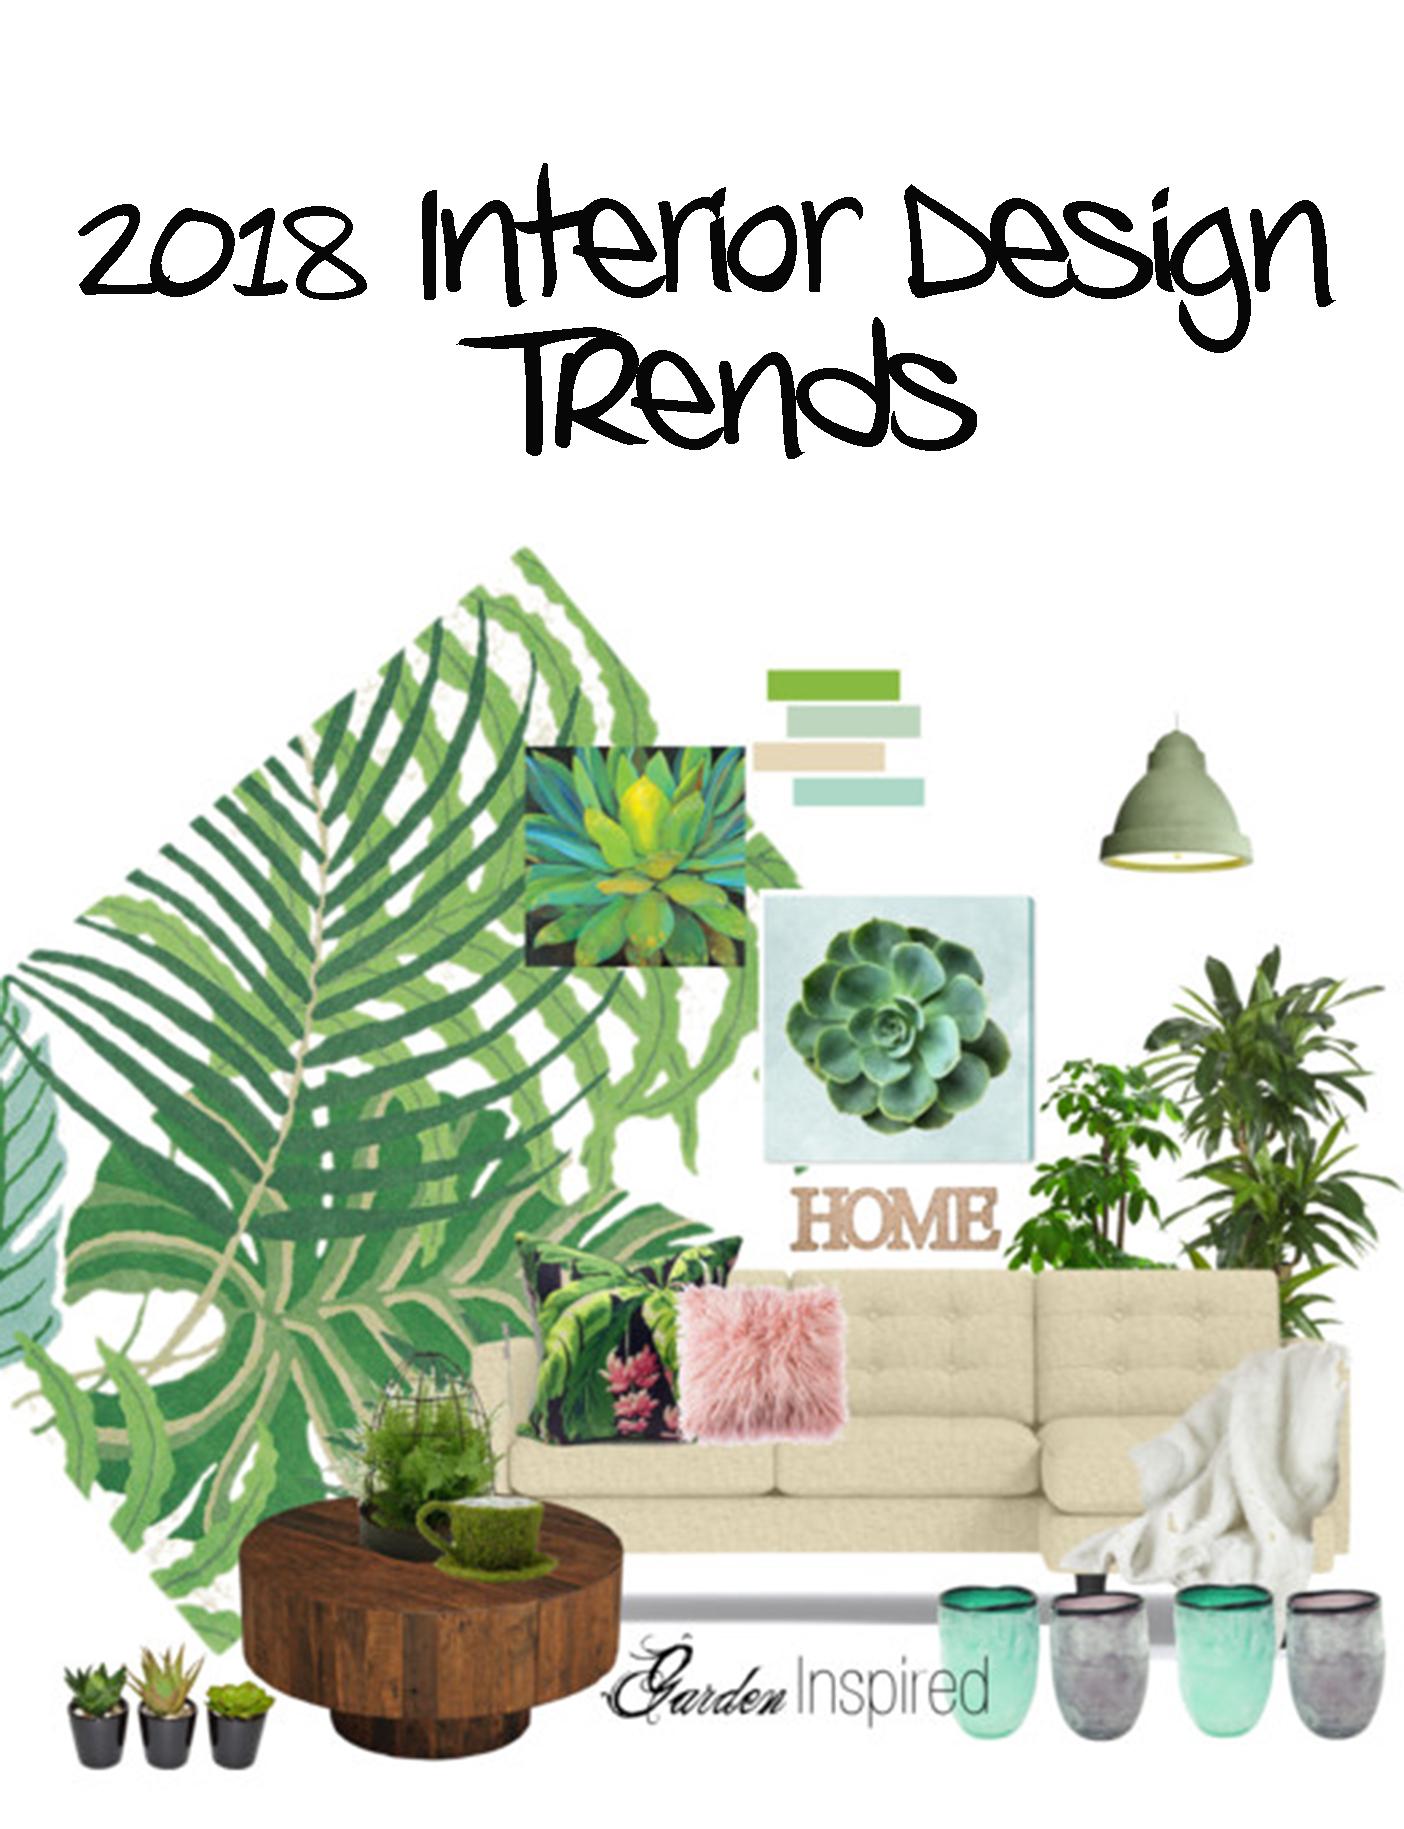 2018 Interior Design trends.jpg